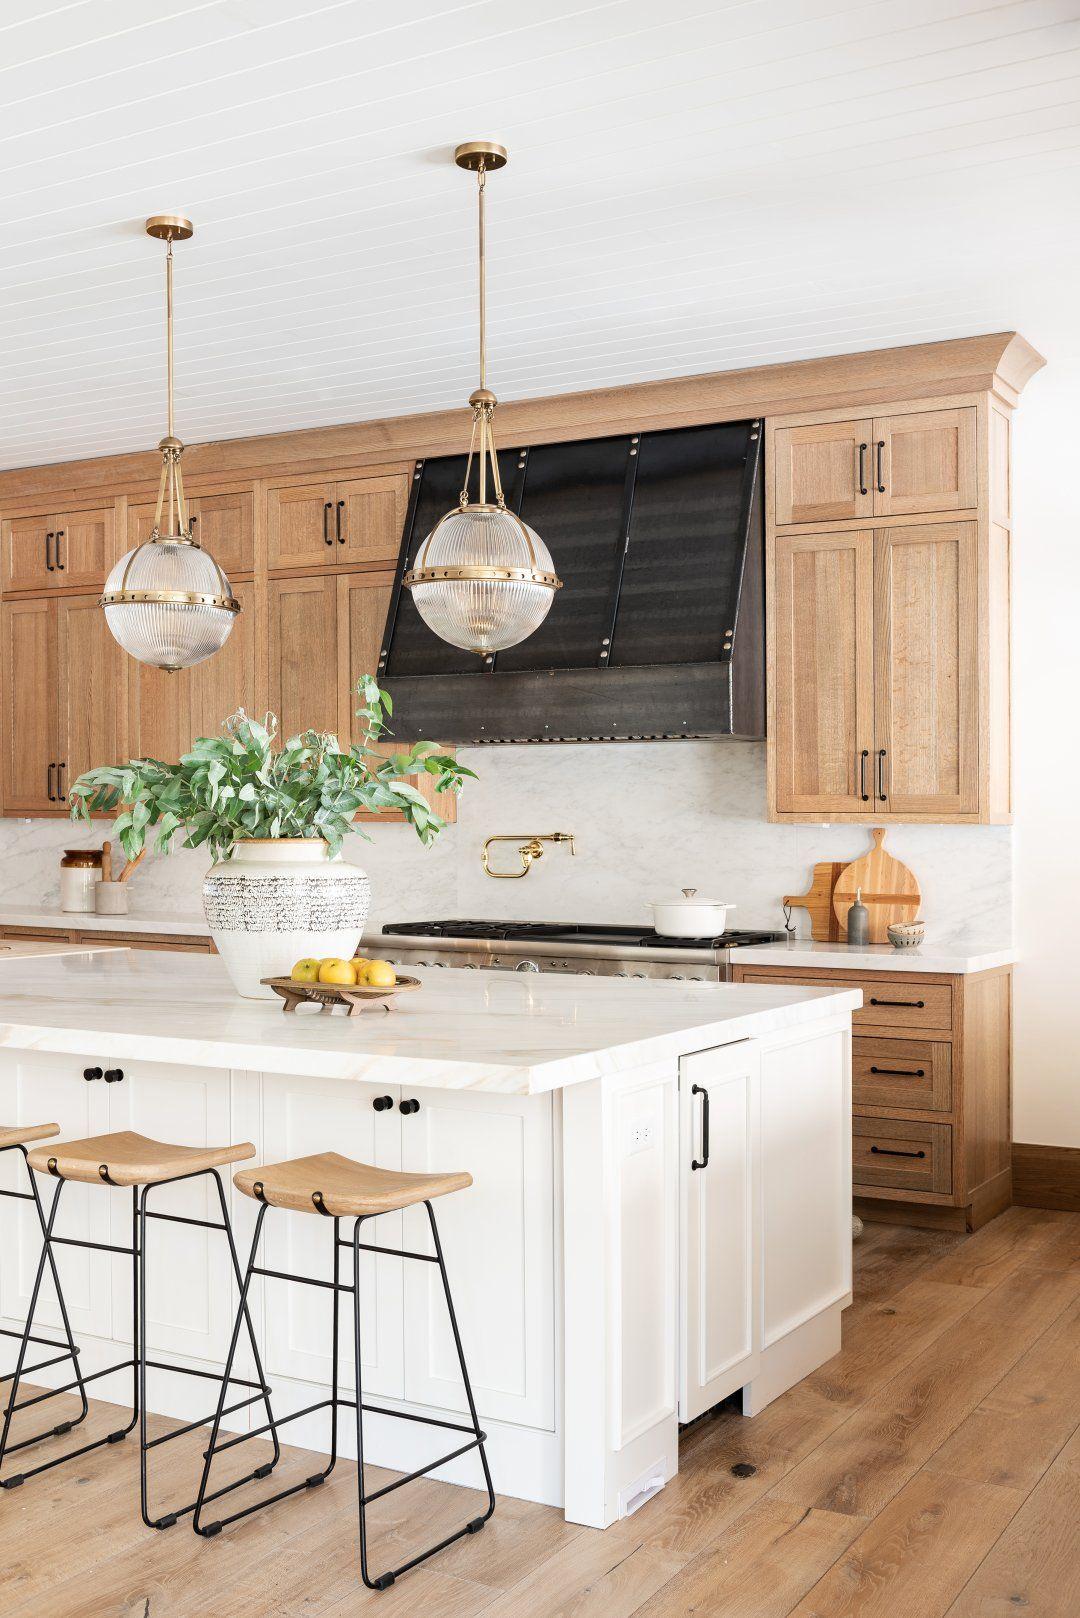 Not Your Mother S Natural Wood Kitchen Studio Mcgee Kitchen Design Decor Latest Kitchen Designs Kitchen Design